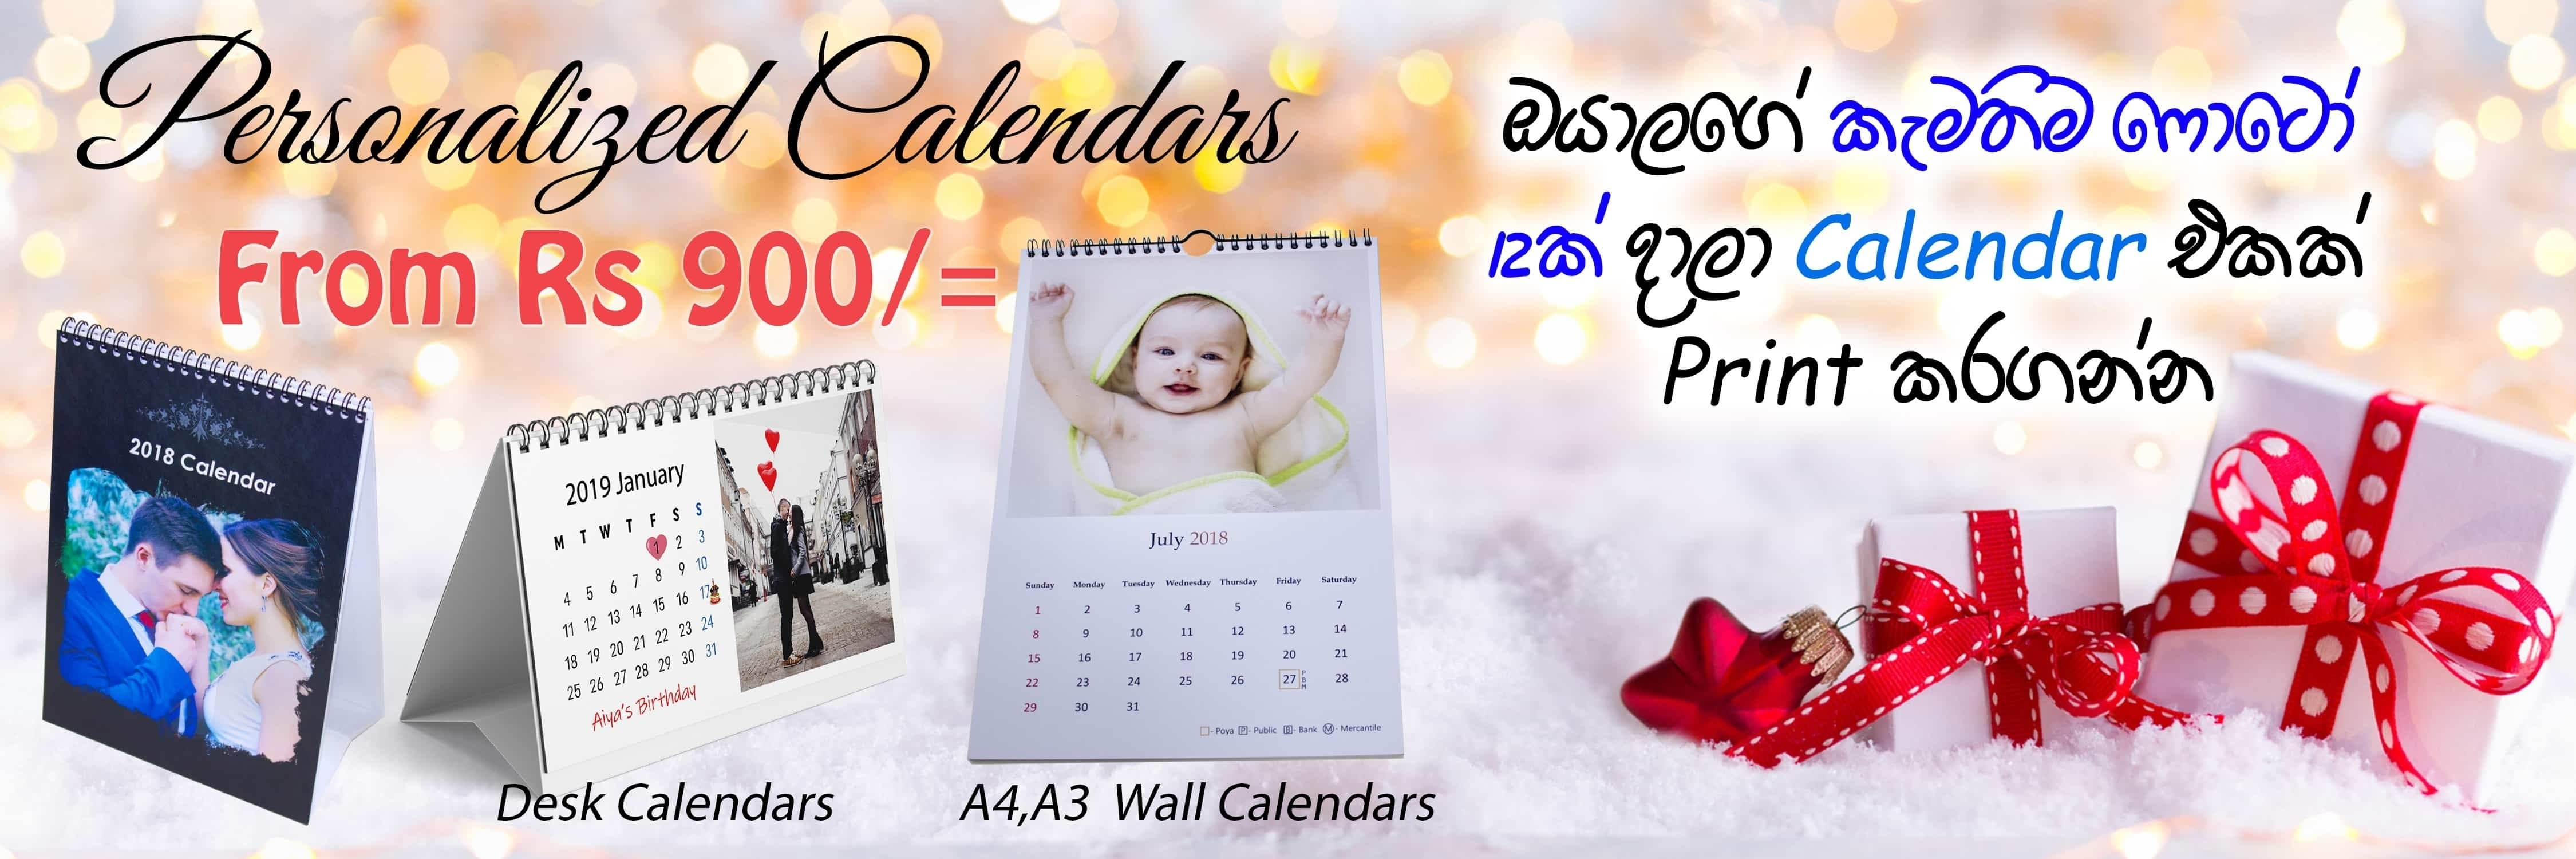 Calendar Printing Sri Lanka • Printable Blank Calendar Template_Calendar Printing Price Sri Lanka